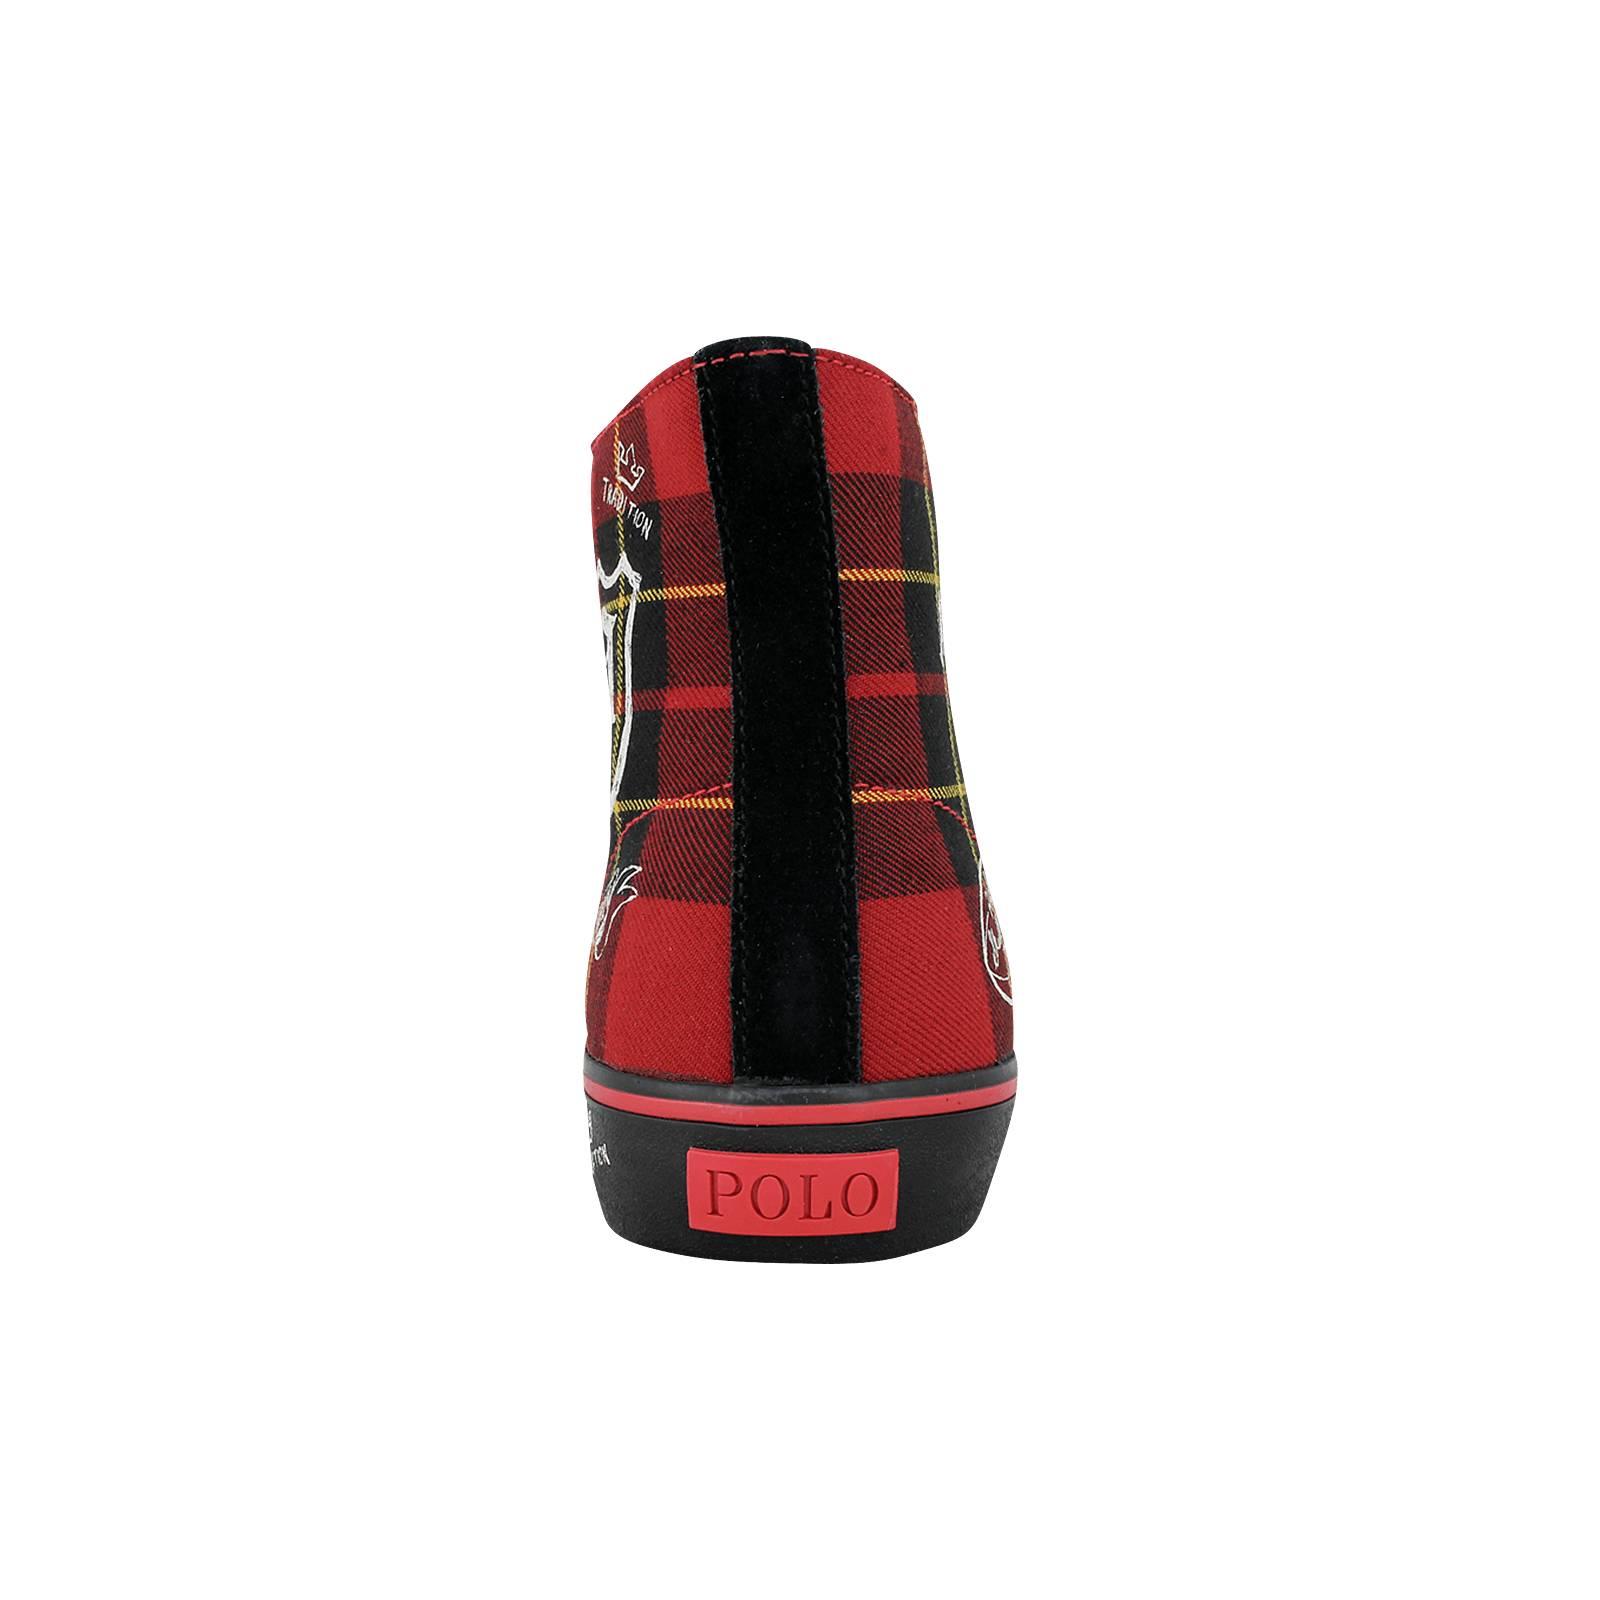 f90d98763fc Solomon - Ανδρικά μποτάκια casual Polo Ralph Lauren από υφασμα και ...